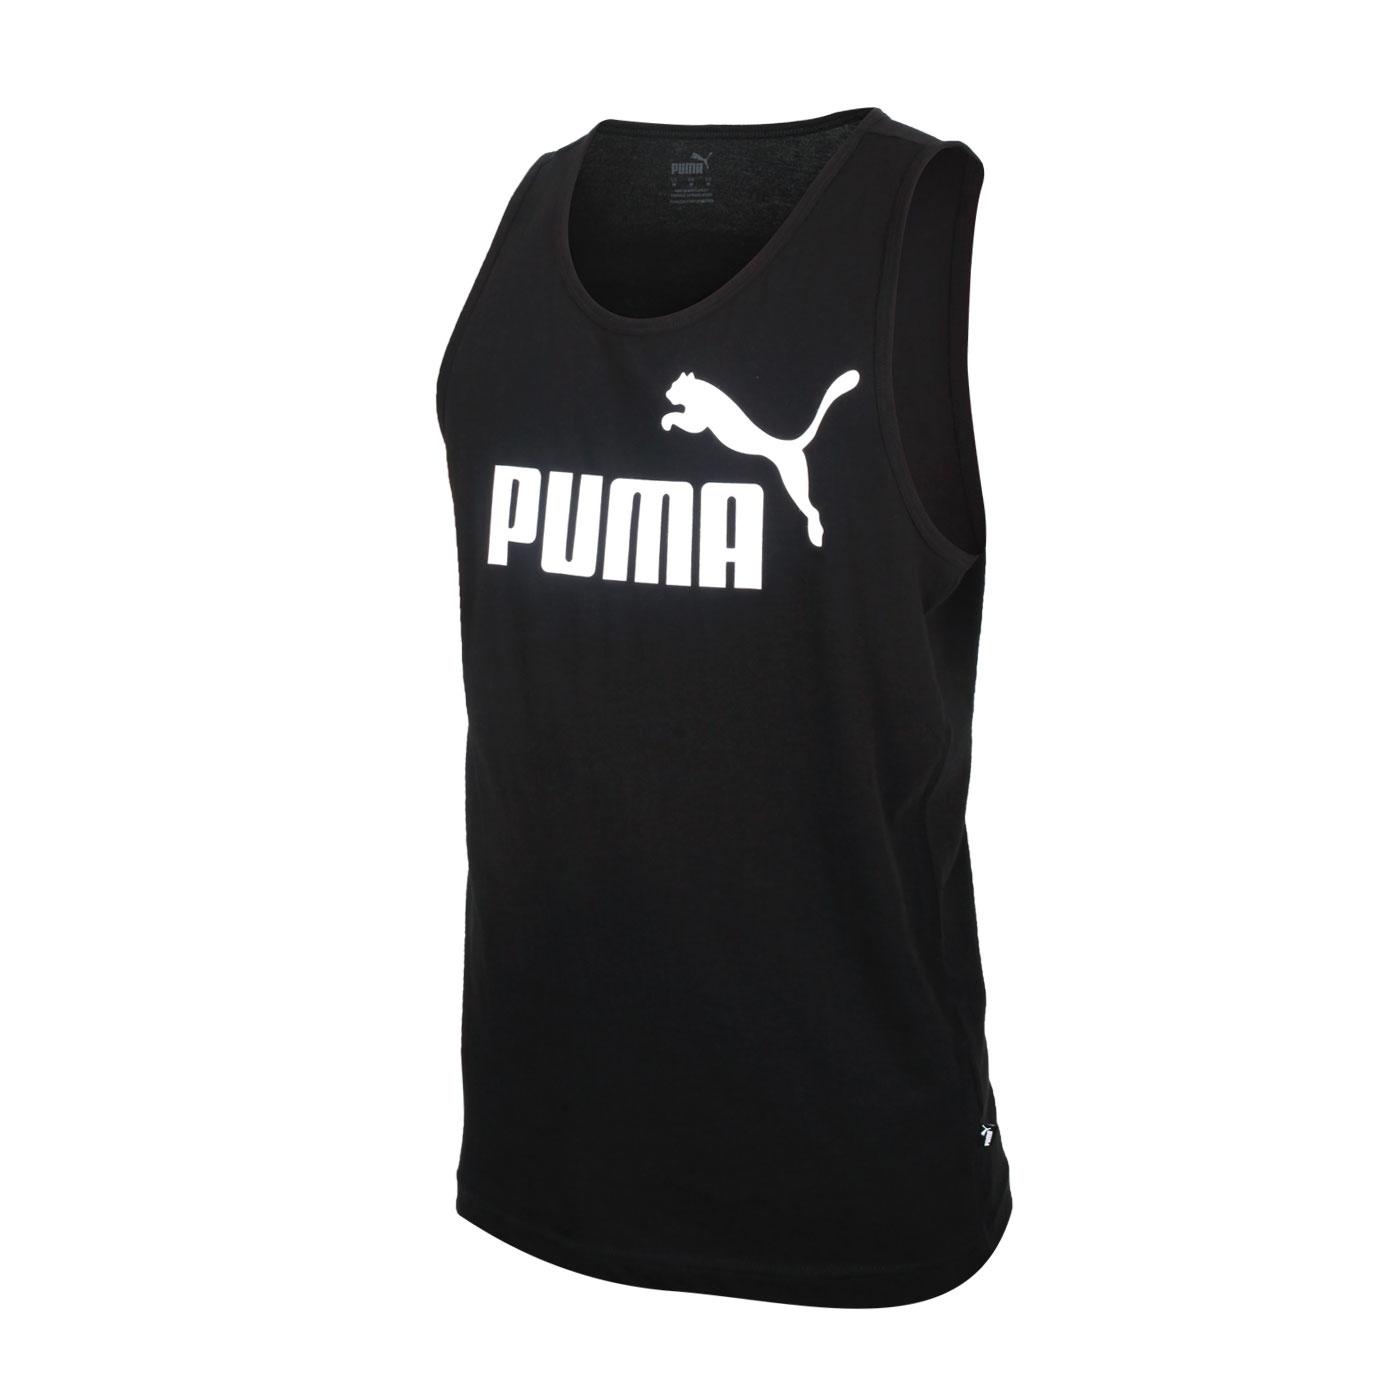 PUMA 男款Logo休閒背心 58667001 - 黑白